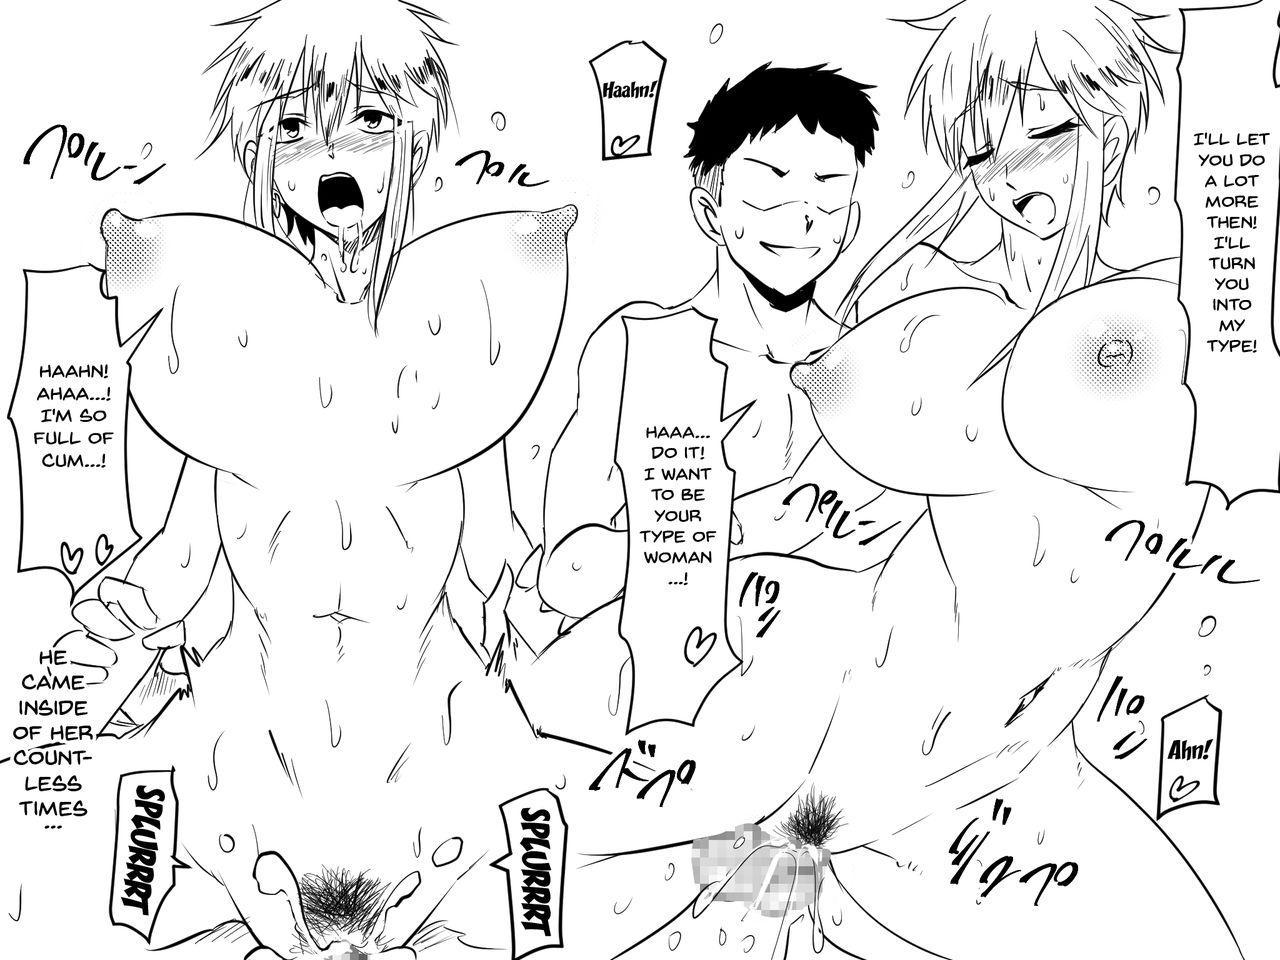 [Mikezoutei] Netorare Haha ~Kachiki de Kimottama no Okaa-san ga Boku o Ijimeru Aitsu no Onna ni Naru Hanashi~   Mom NTR ~A Story Of How My Gutsy Mom Ended Up Becoming My Bully's Plaything~ [English] {Doujins.com} 23